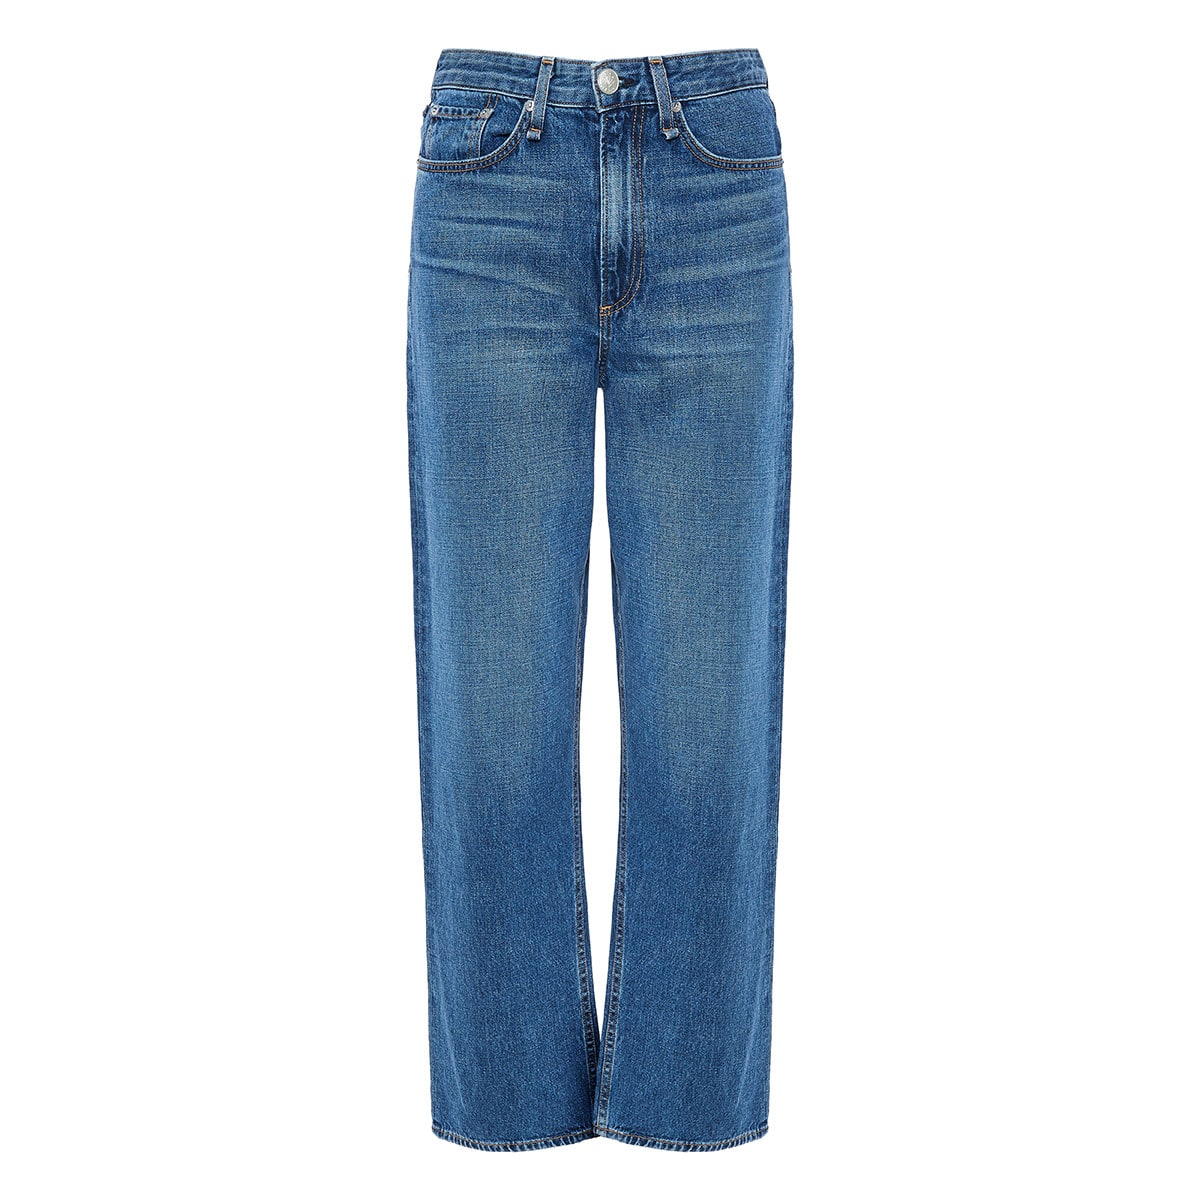 Ruth high-waist straight jeans